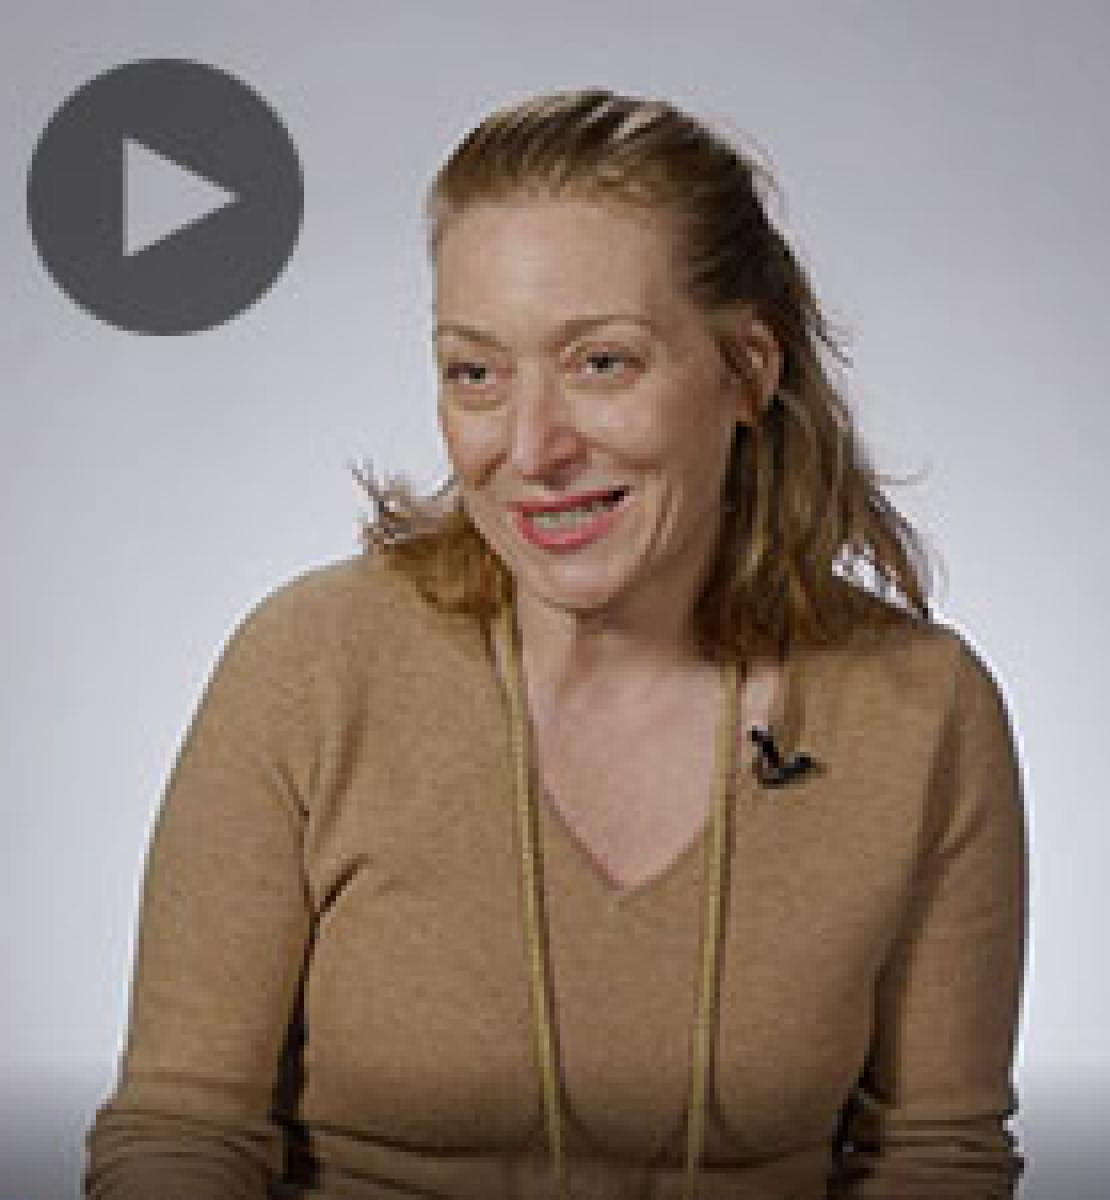 Screenshot from video message shows Resident Coordinator, Allegra Baiocchi